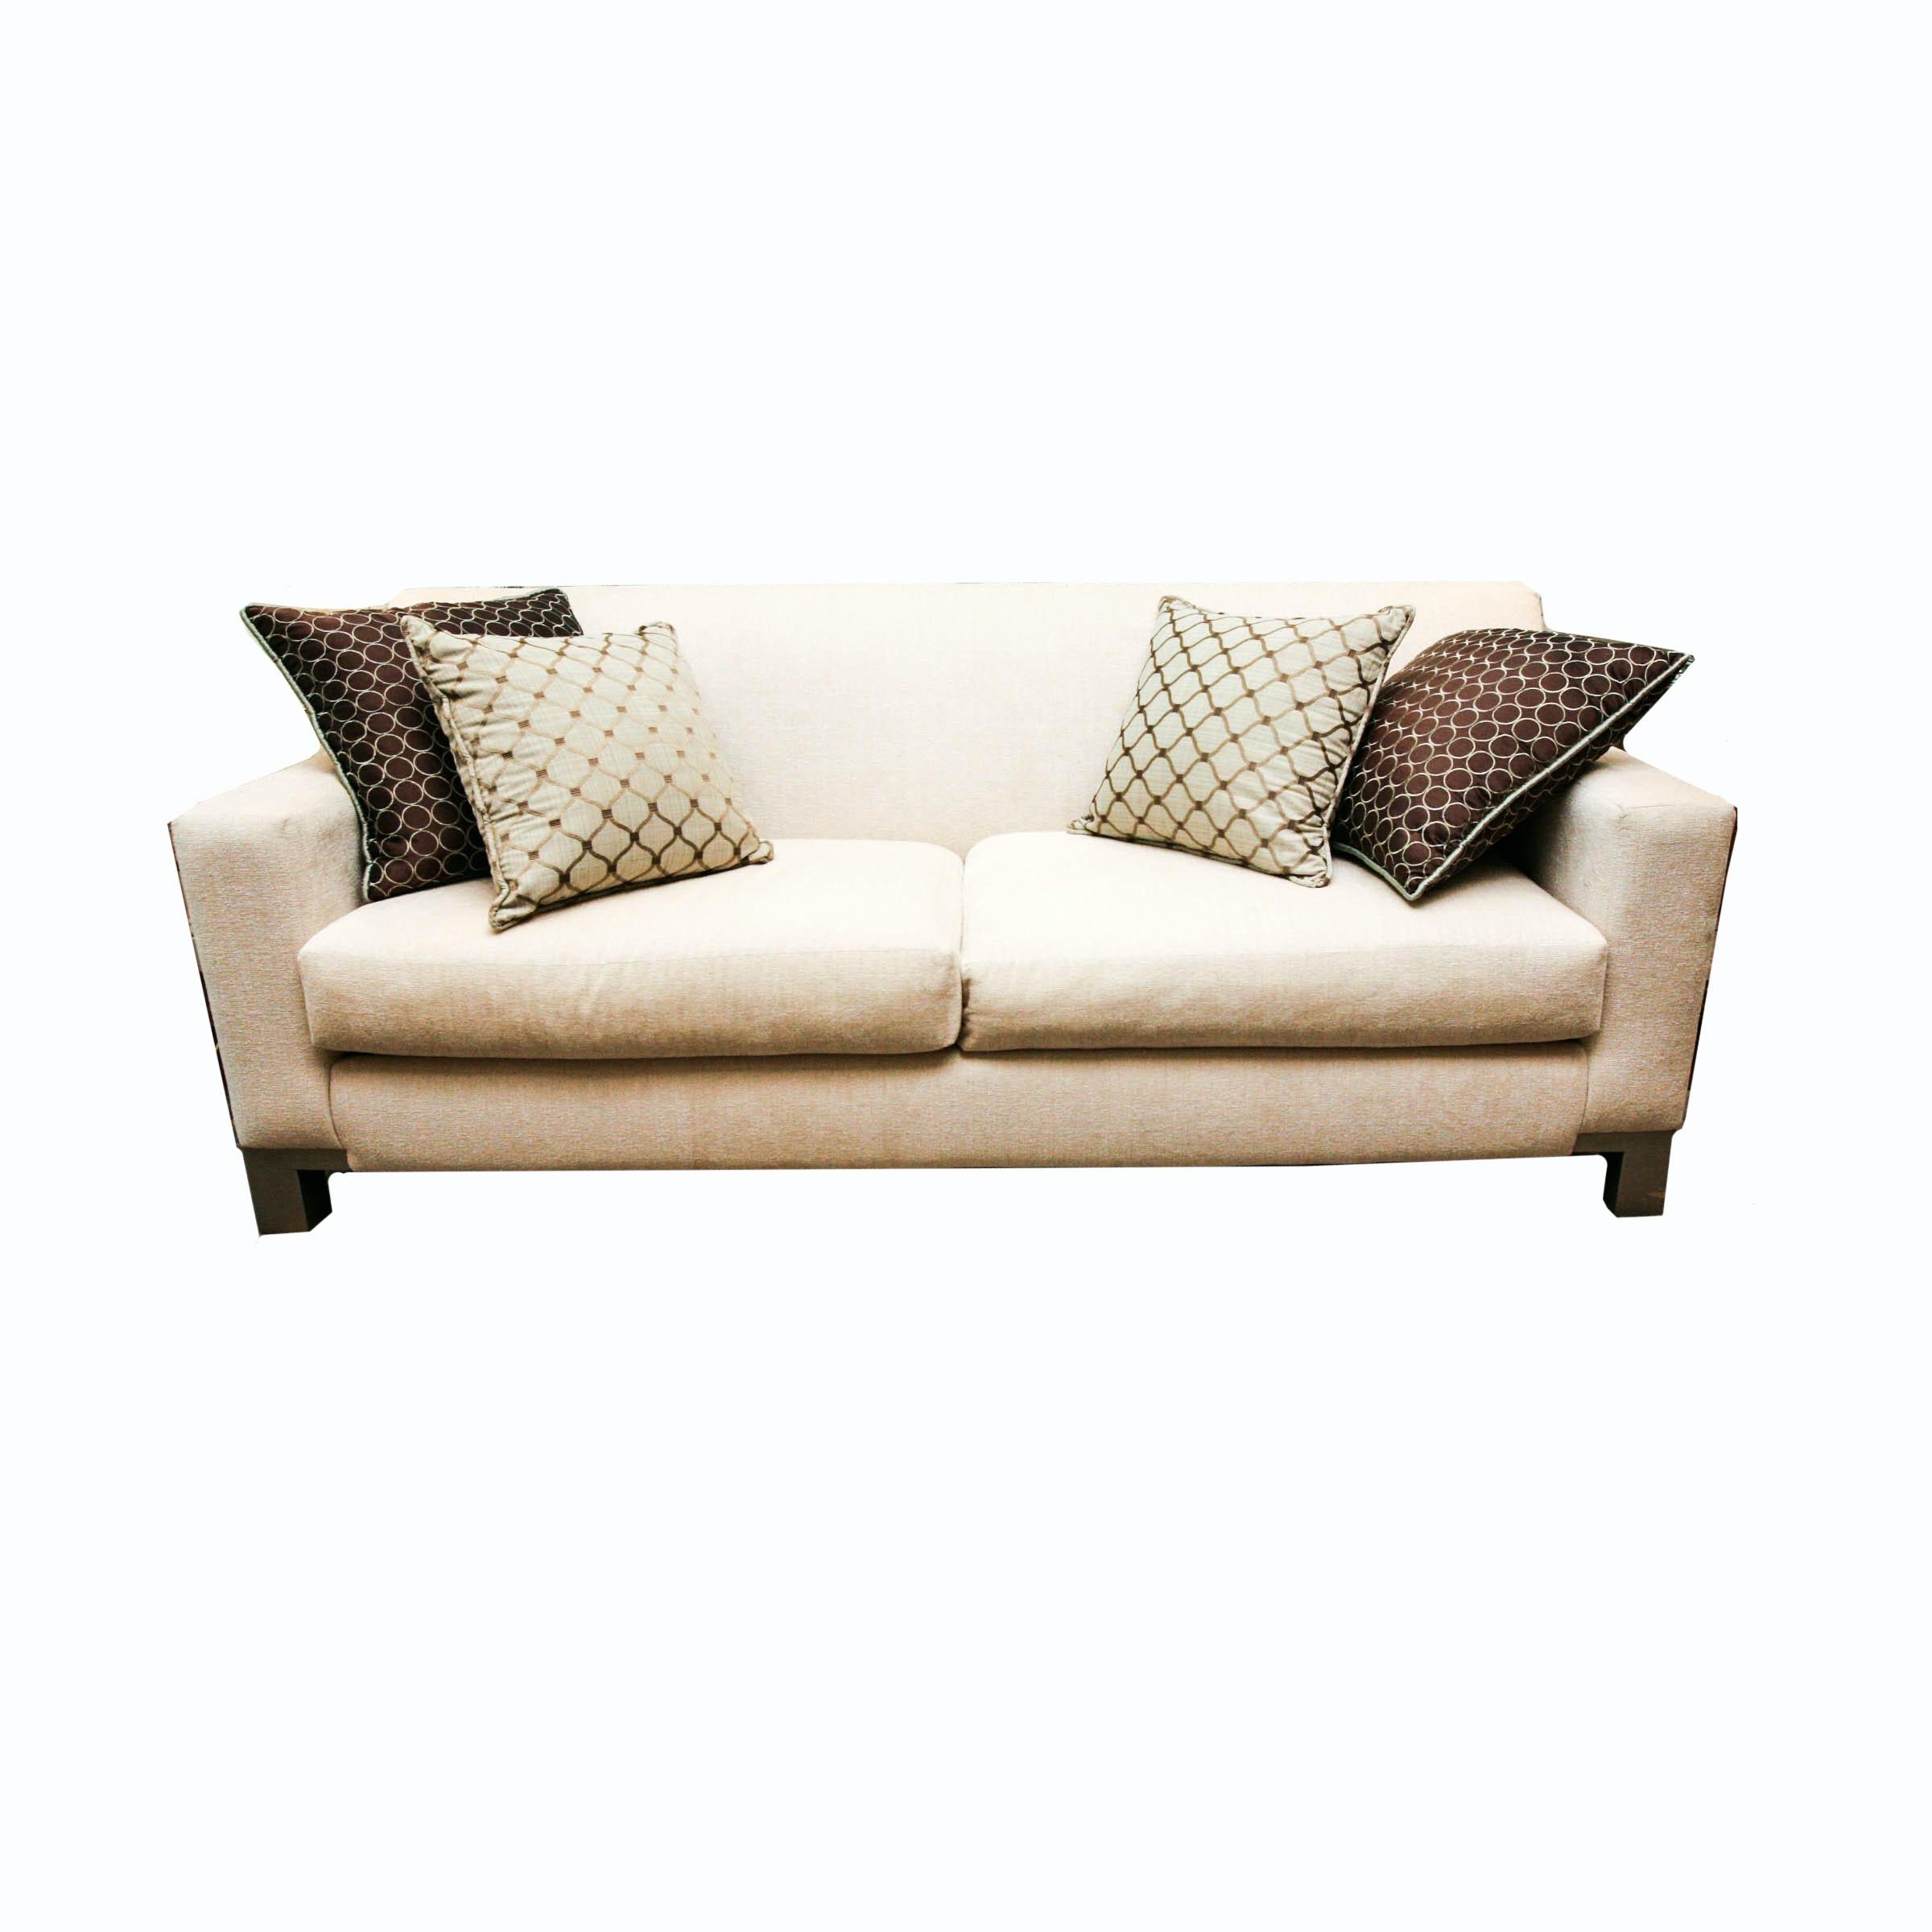 Contemporary Cream Chenille Sofa With Wood Legs ...